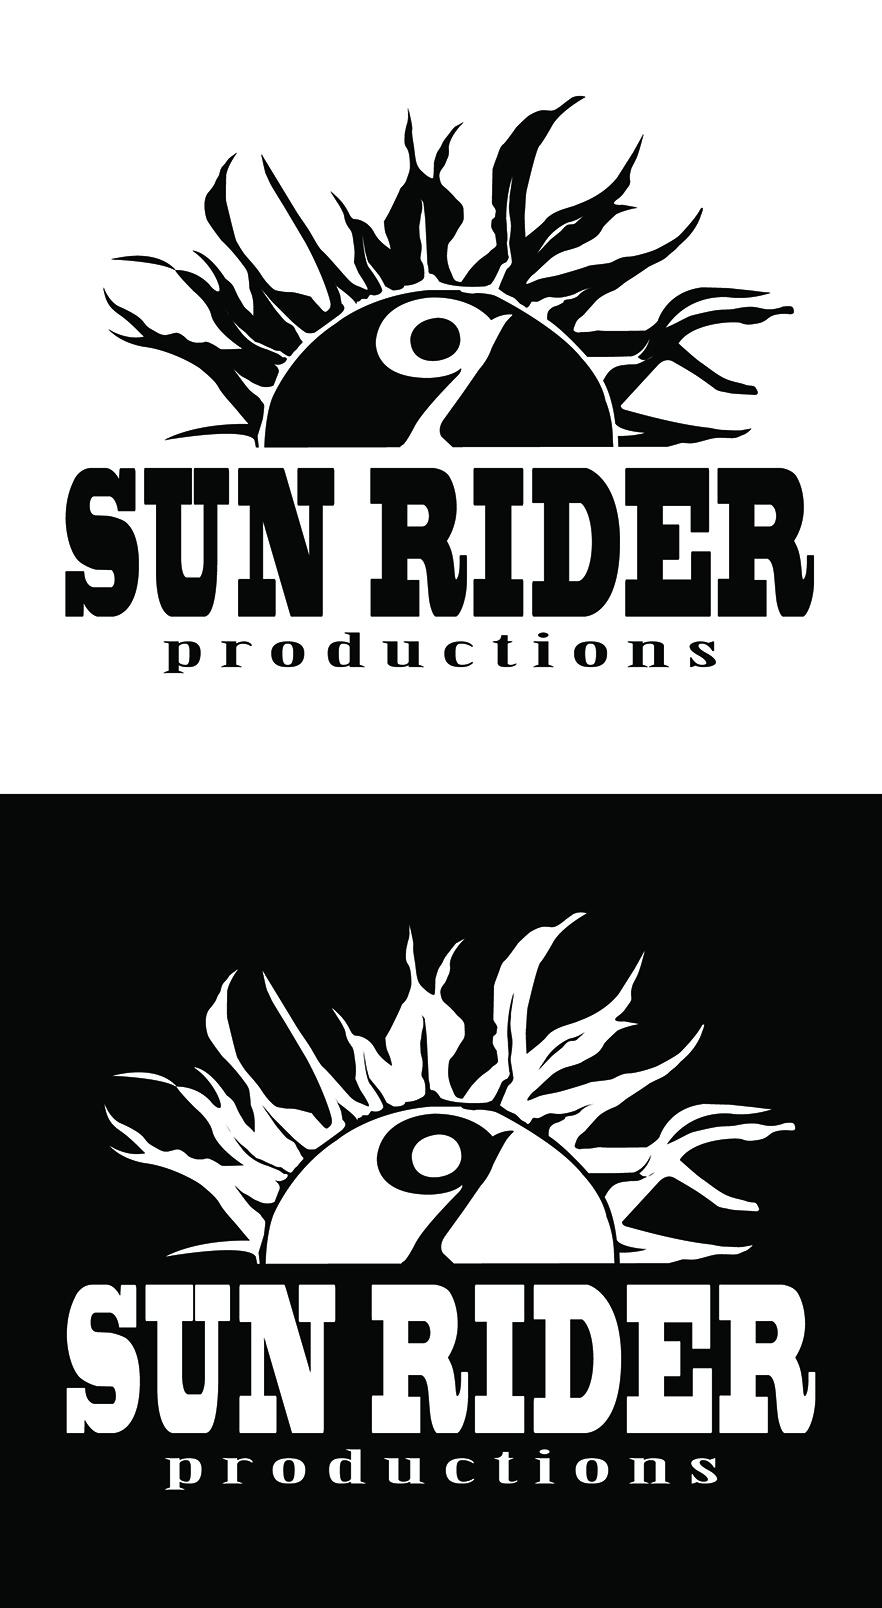 Sun Rider 9 Productions logo